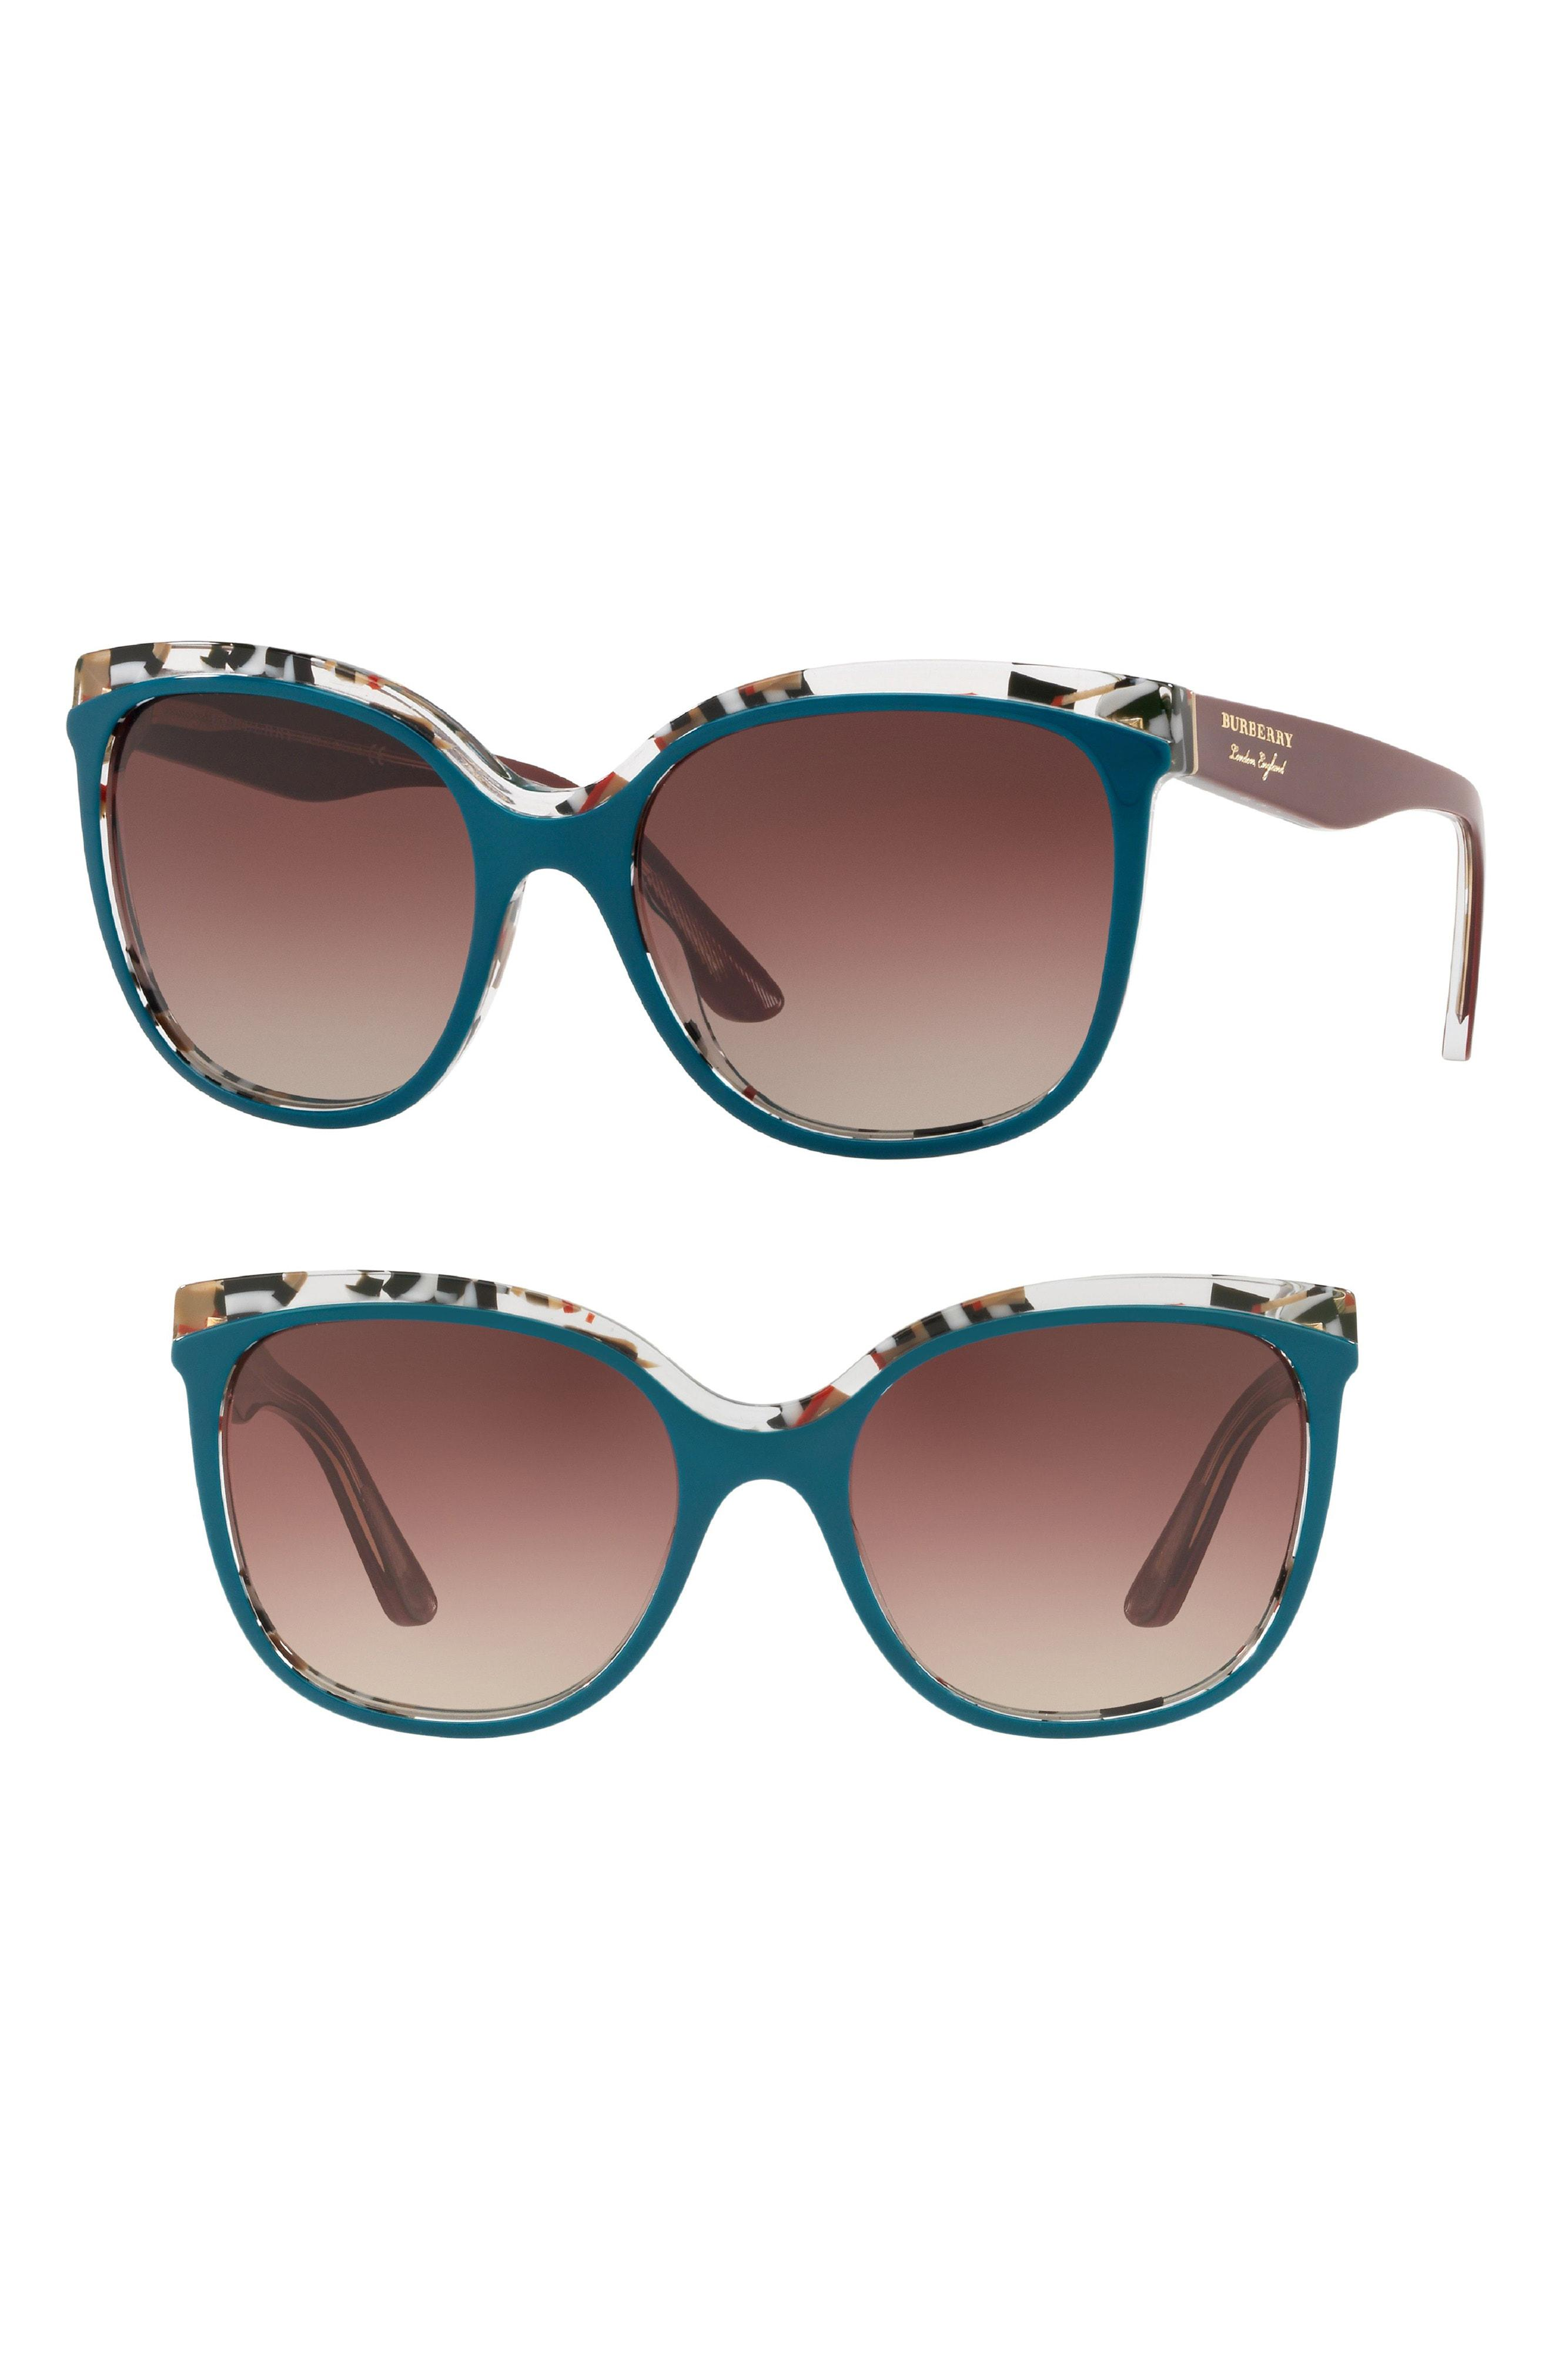 4de7f18cd13a Lyst - Burberry Marblecheck 55mm Square Sunglasses - Dark Green ...